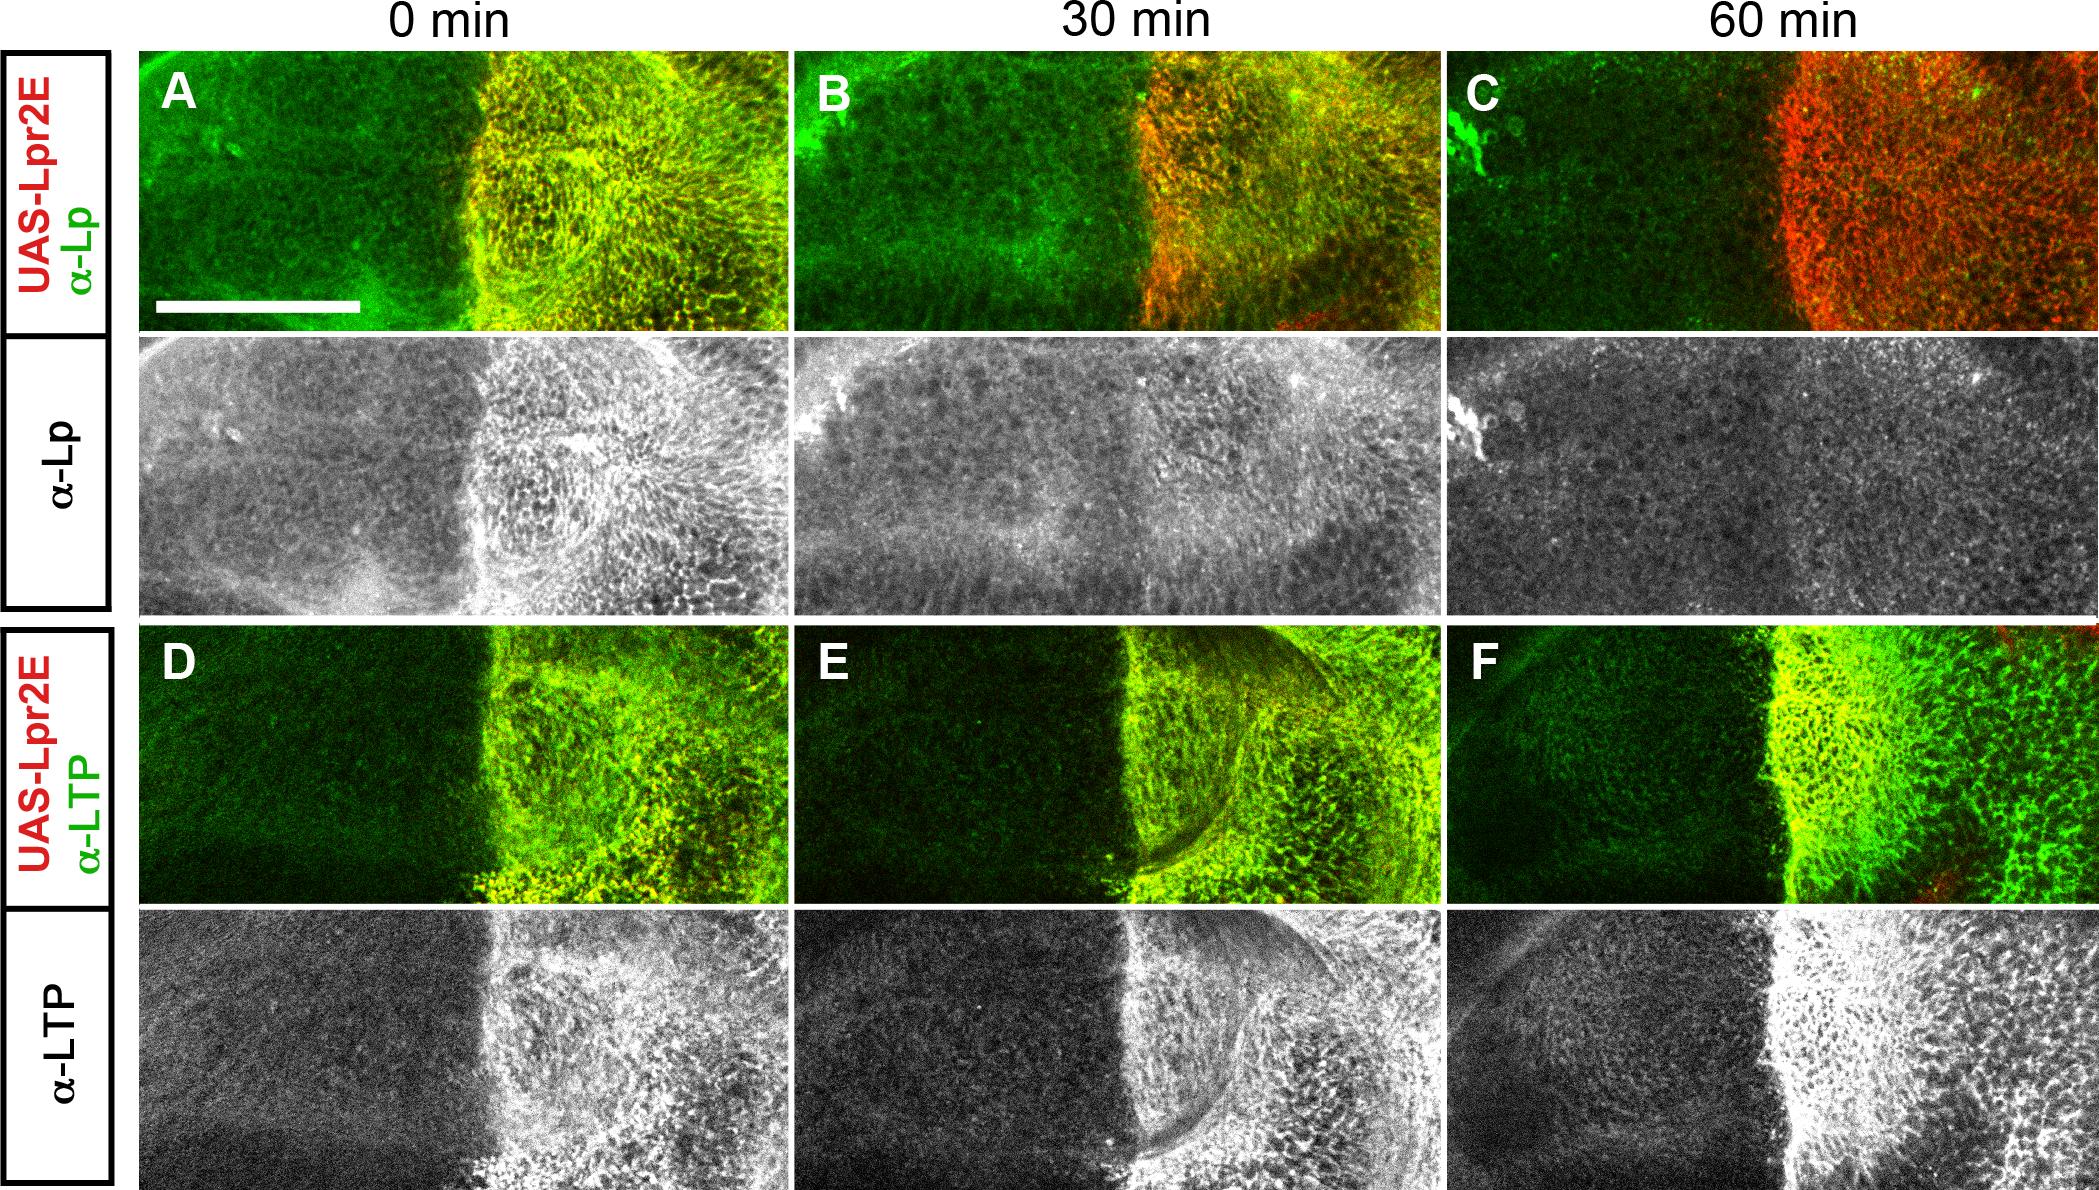 Lpr2E-mediated lipophorin association with cells is transient.